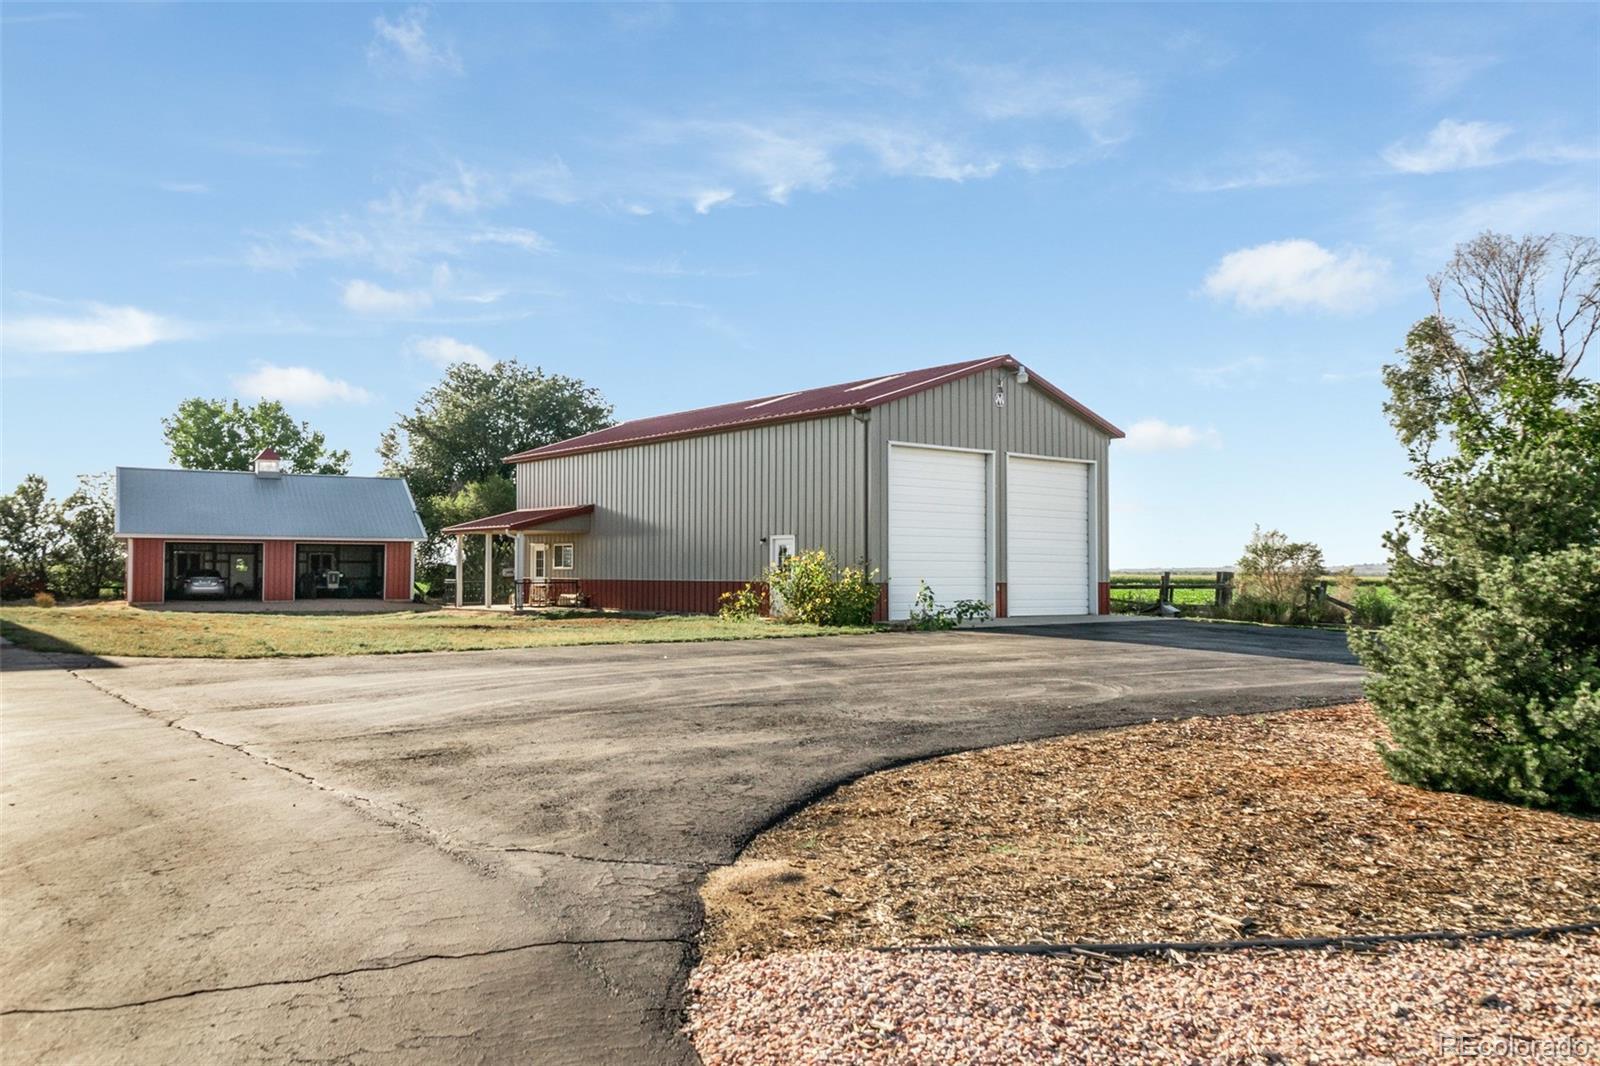 13965 County Road 42, Platteville, CO